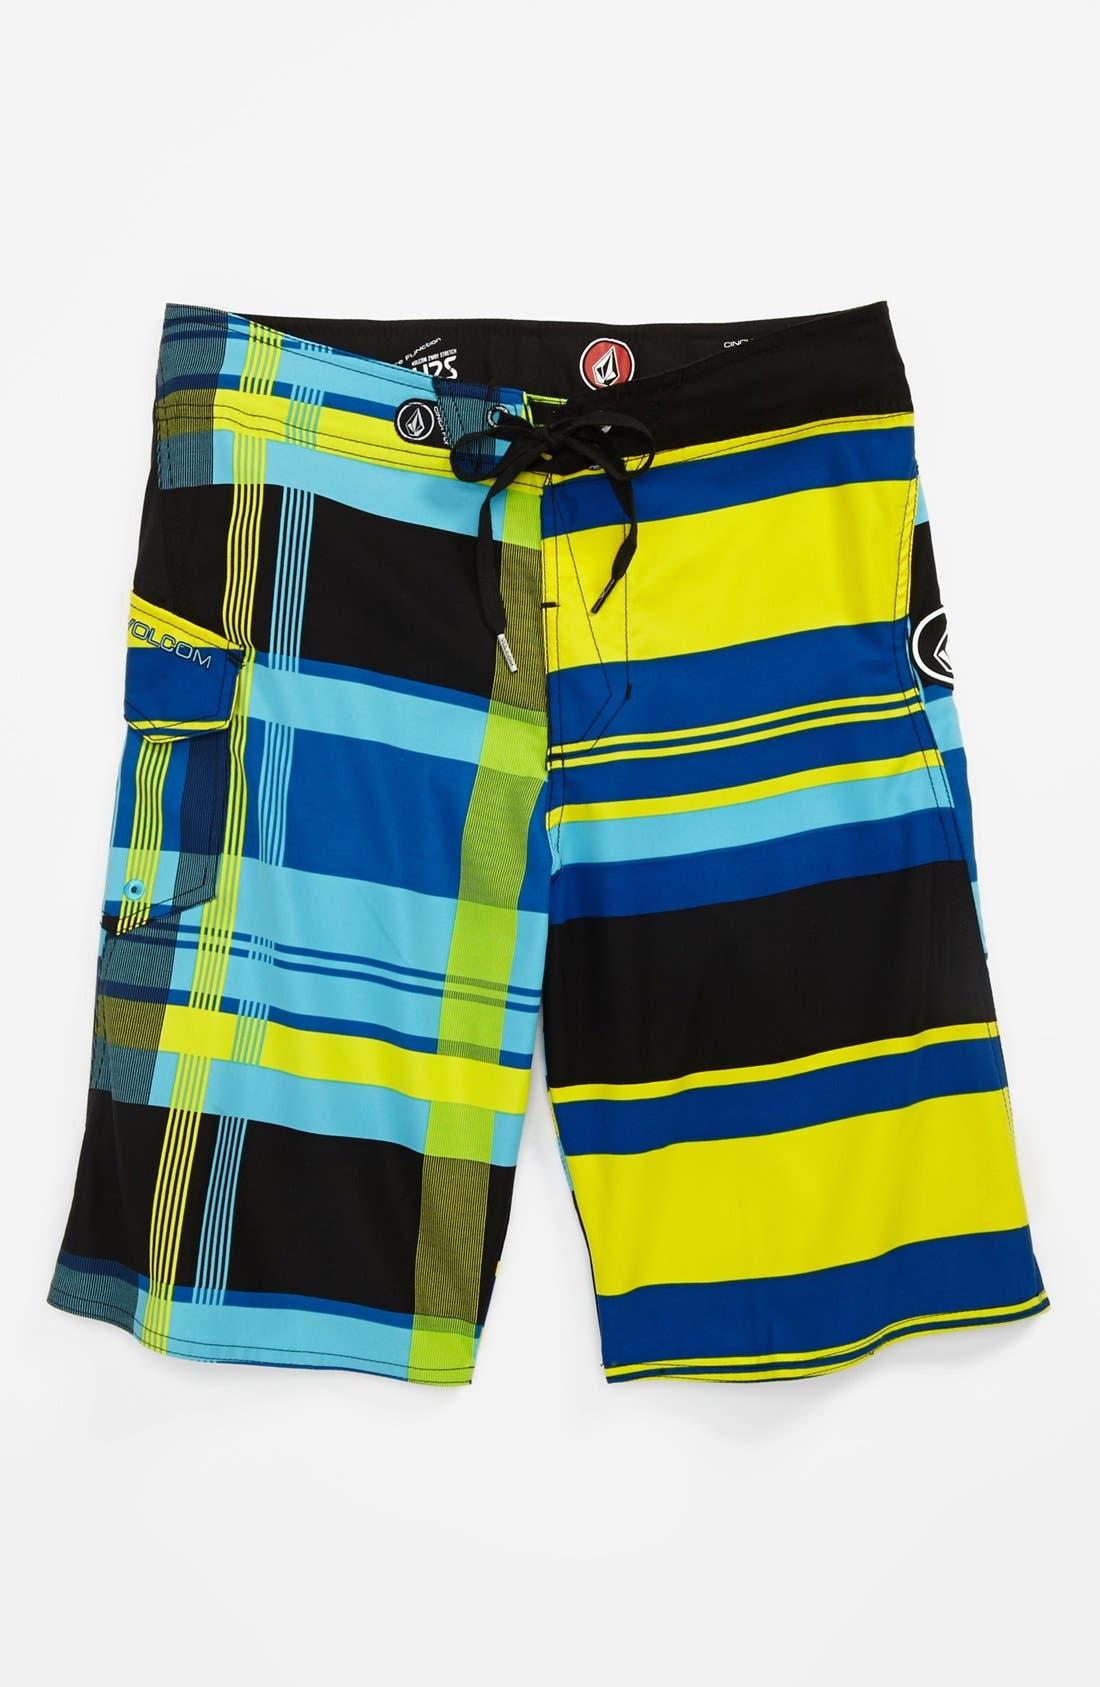 Alternate Image 1 Selected - Volcom 'Maguro' Board Shorts (Little Boys)